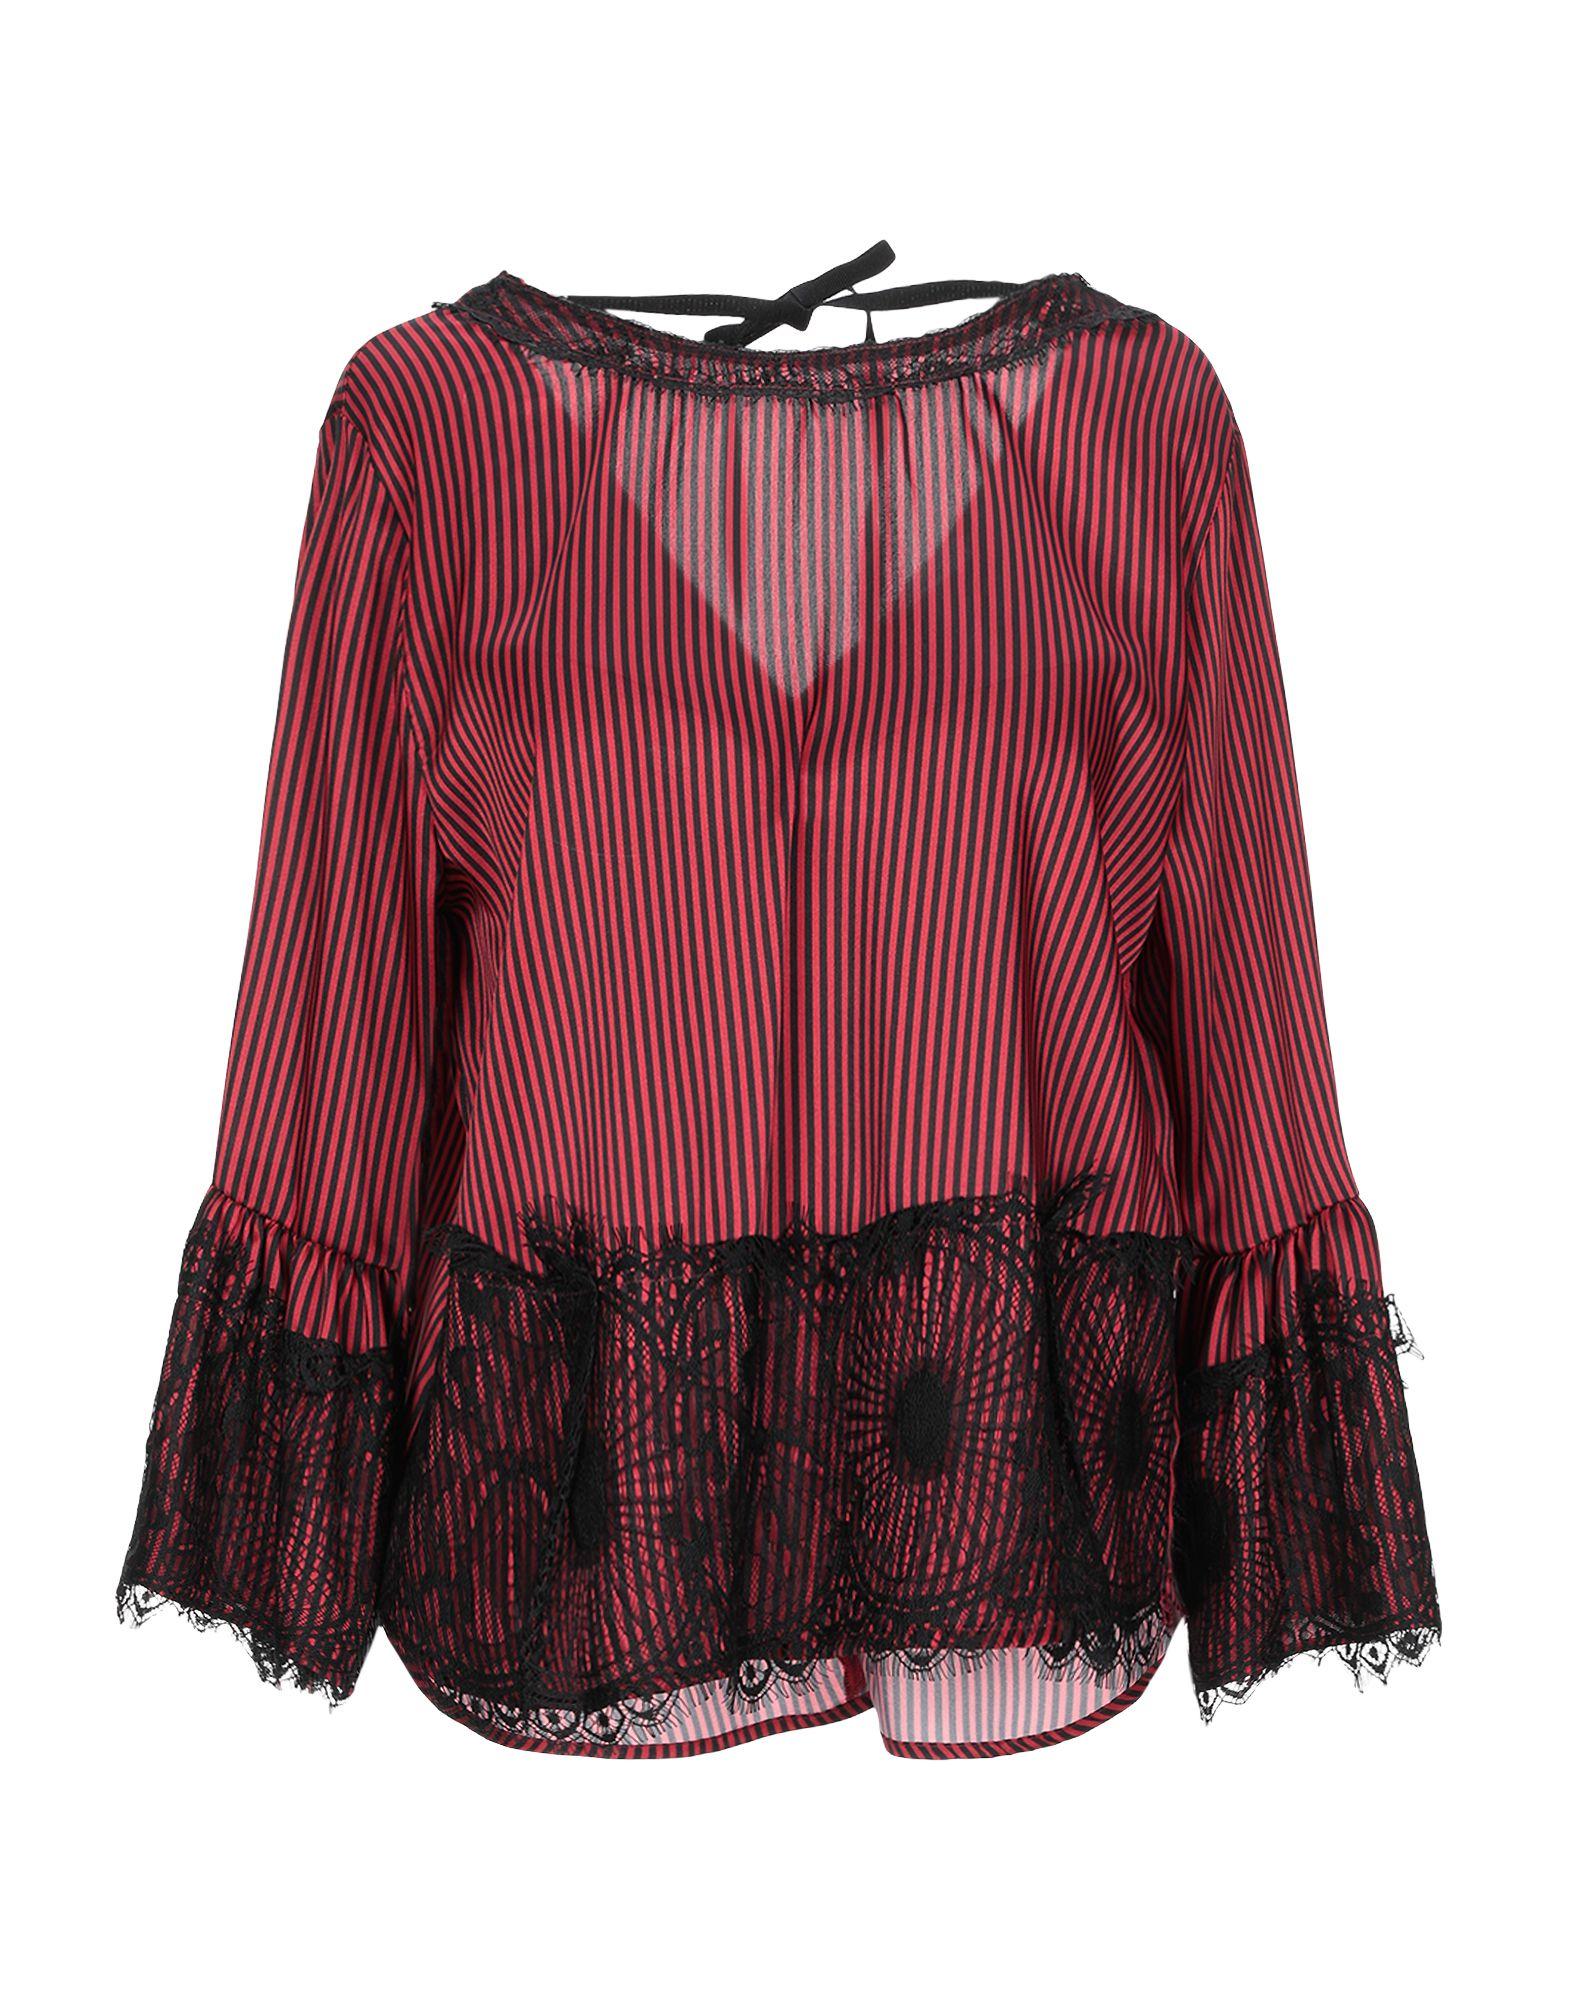 VICOLO Блузка блузка в полоску marice